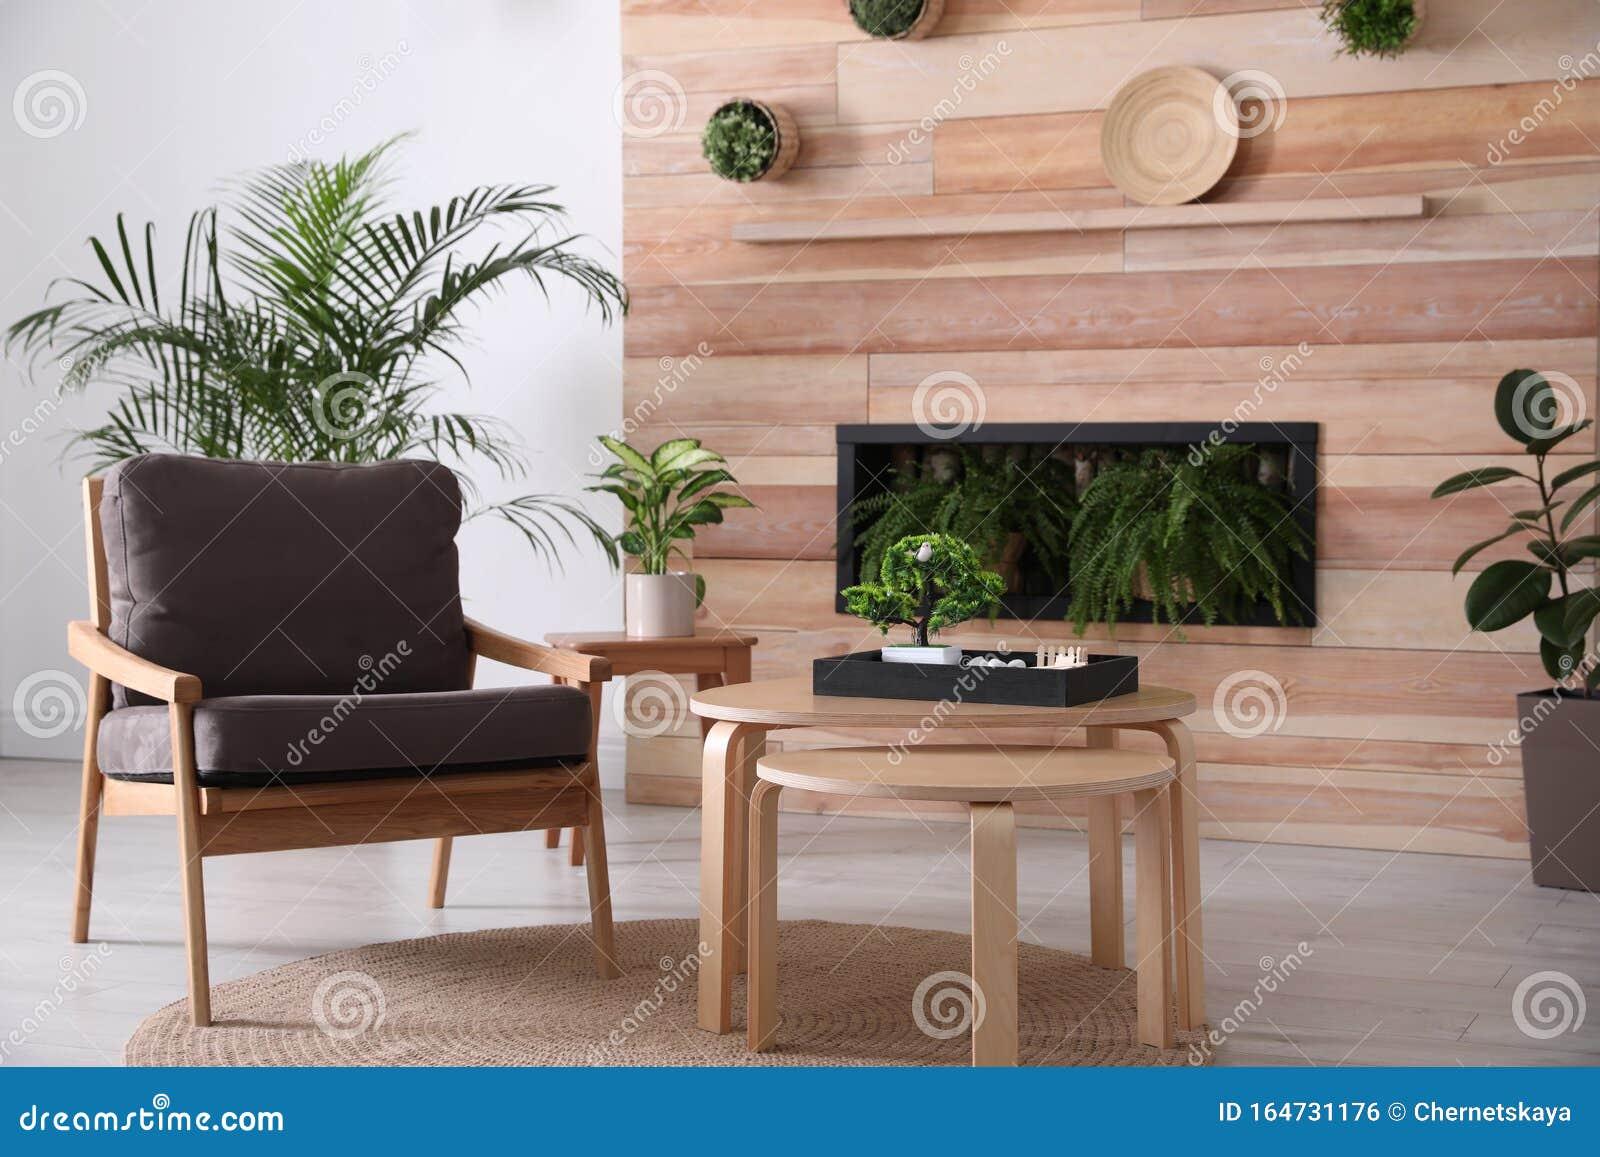 Stylish Living Room Interior With Armchair Green Plants And Miniature Zen Garden Home Design Stock Photo Image Of Idea Condo 164731176